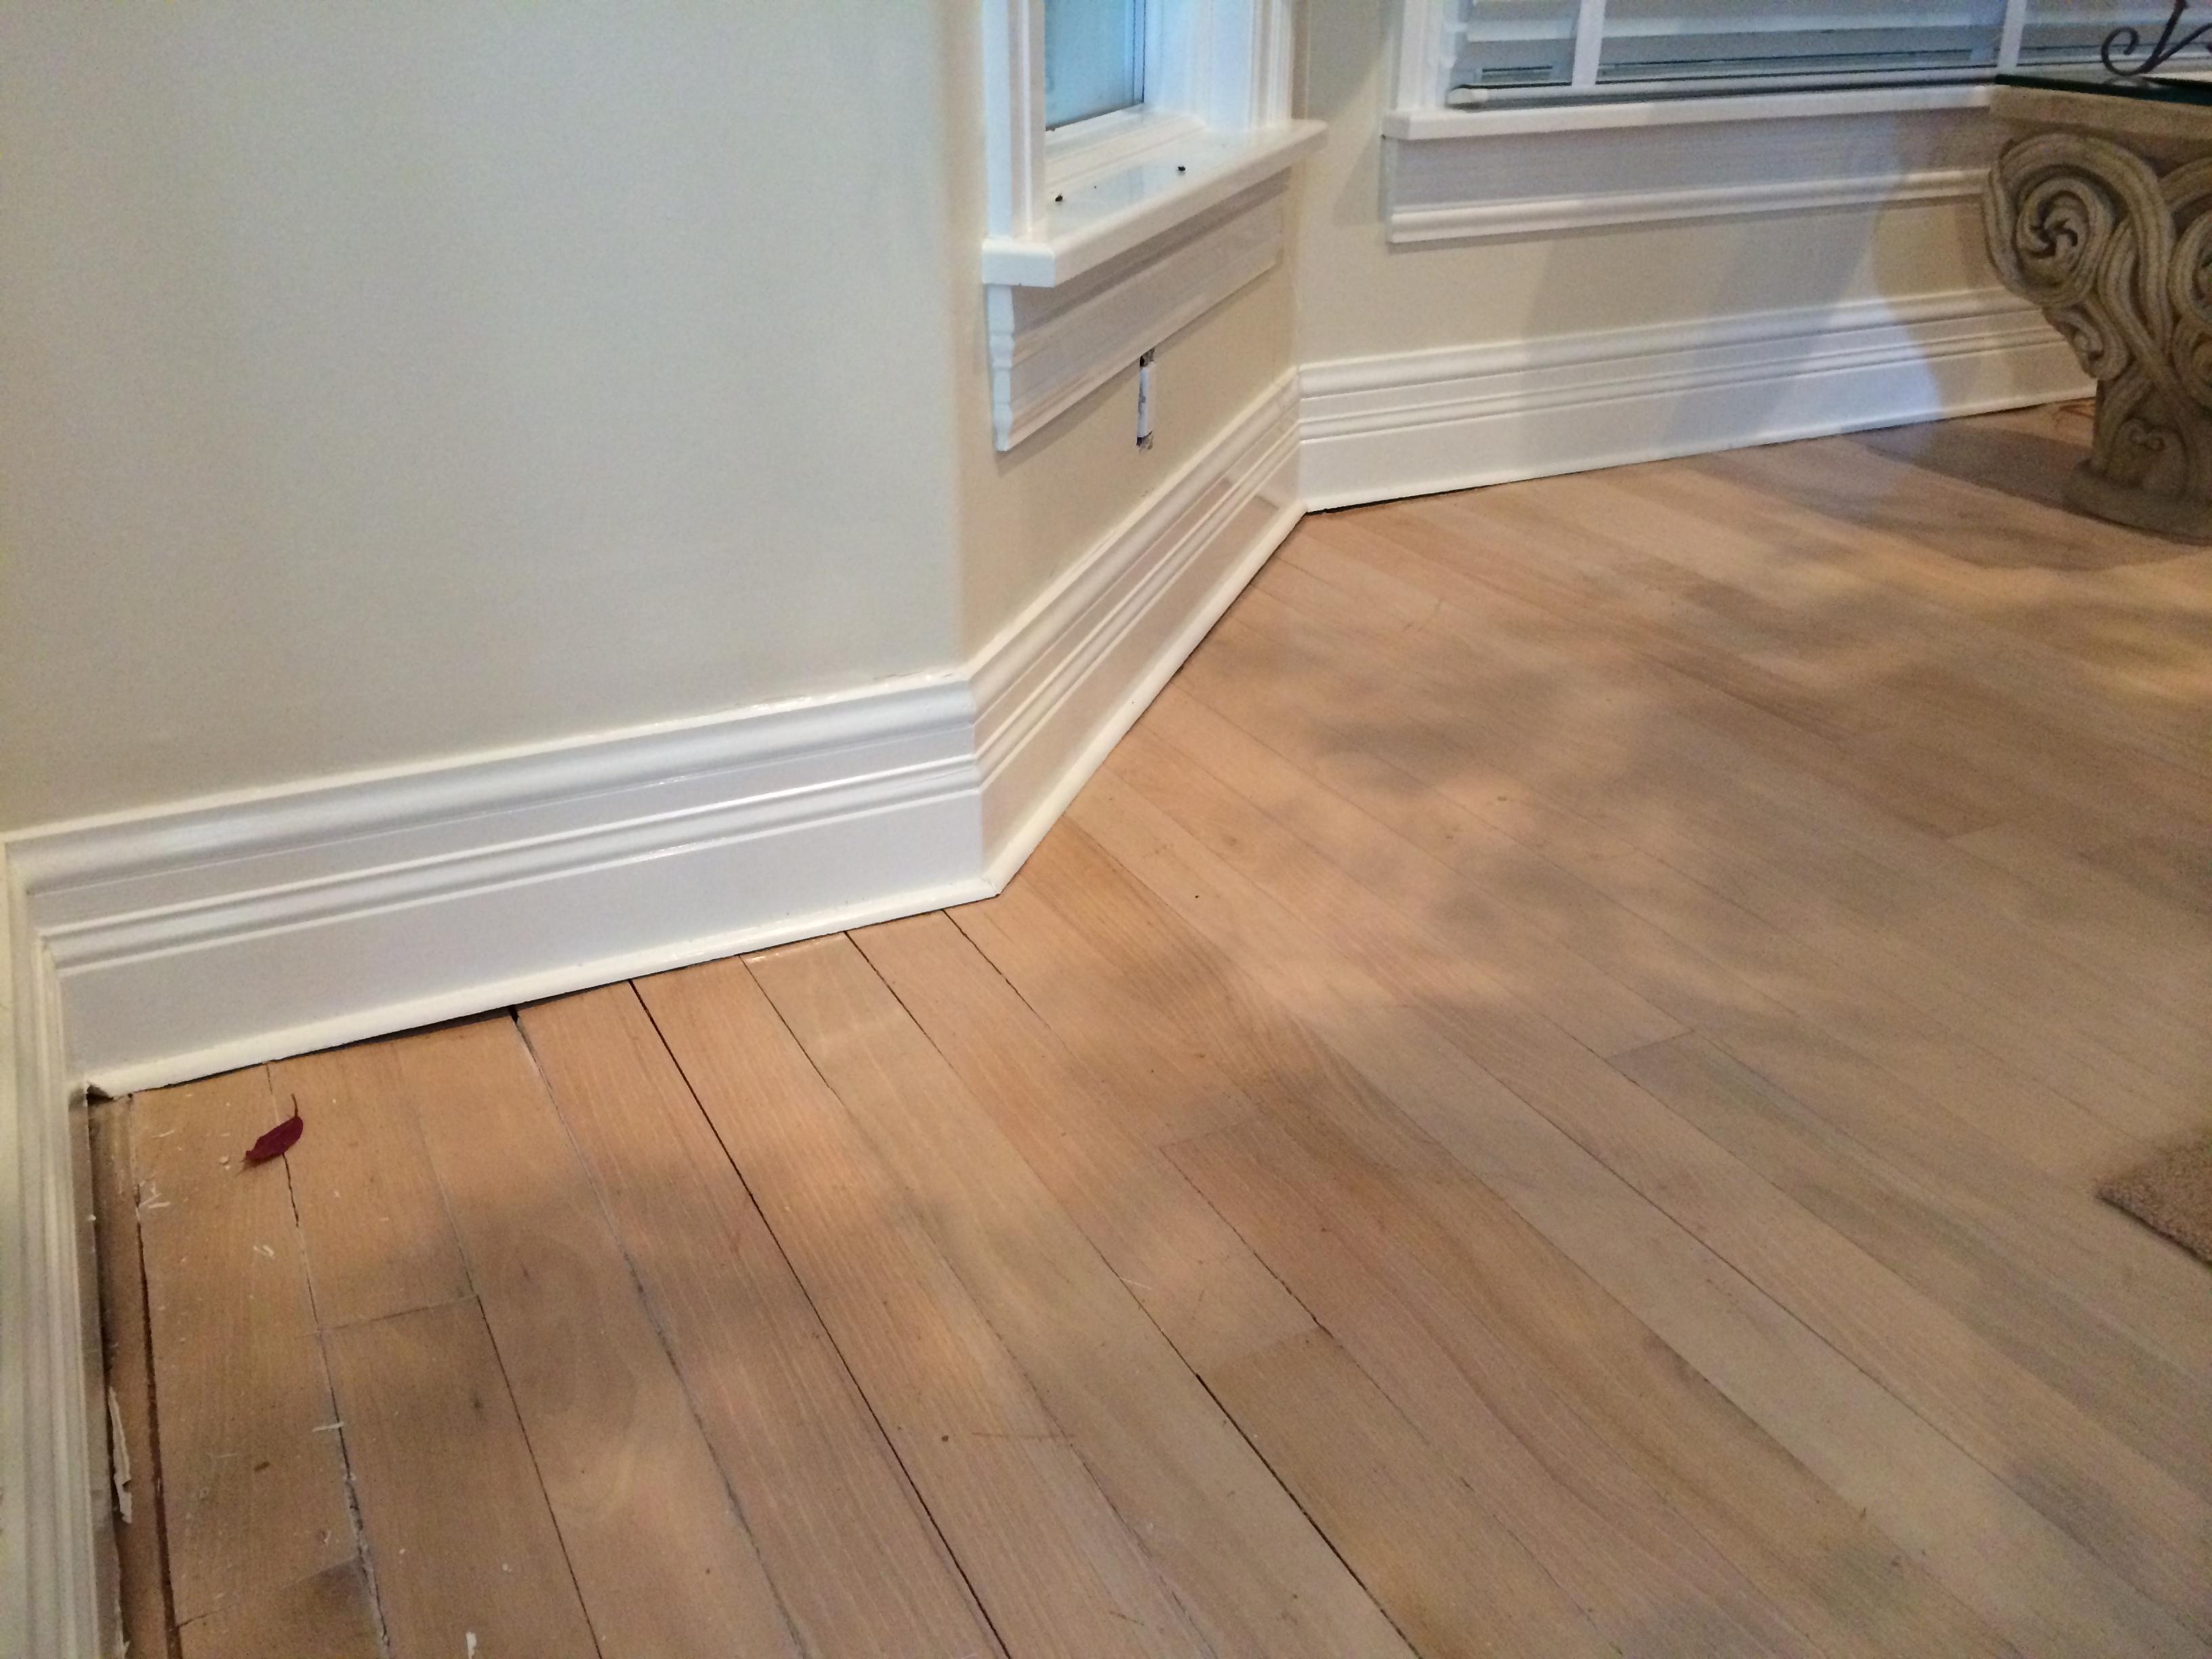 Water Damaged Wood Floor Planks Code Red Restoration Llc Water Damage Restoration Fire